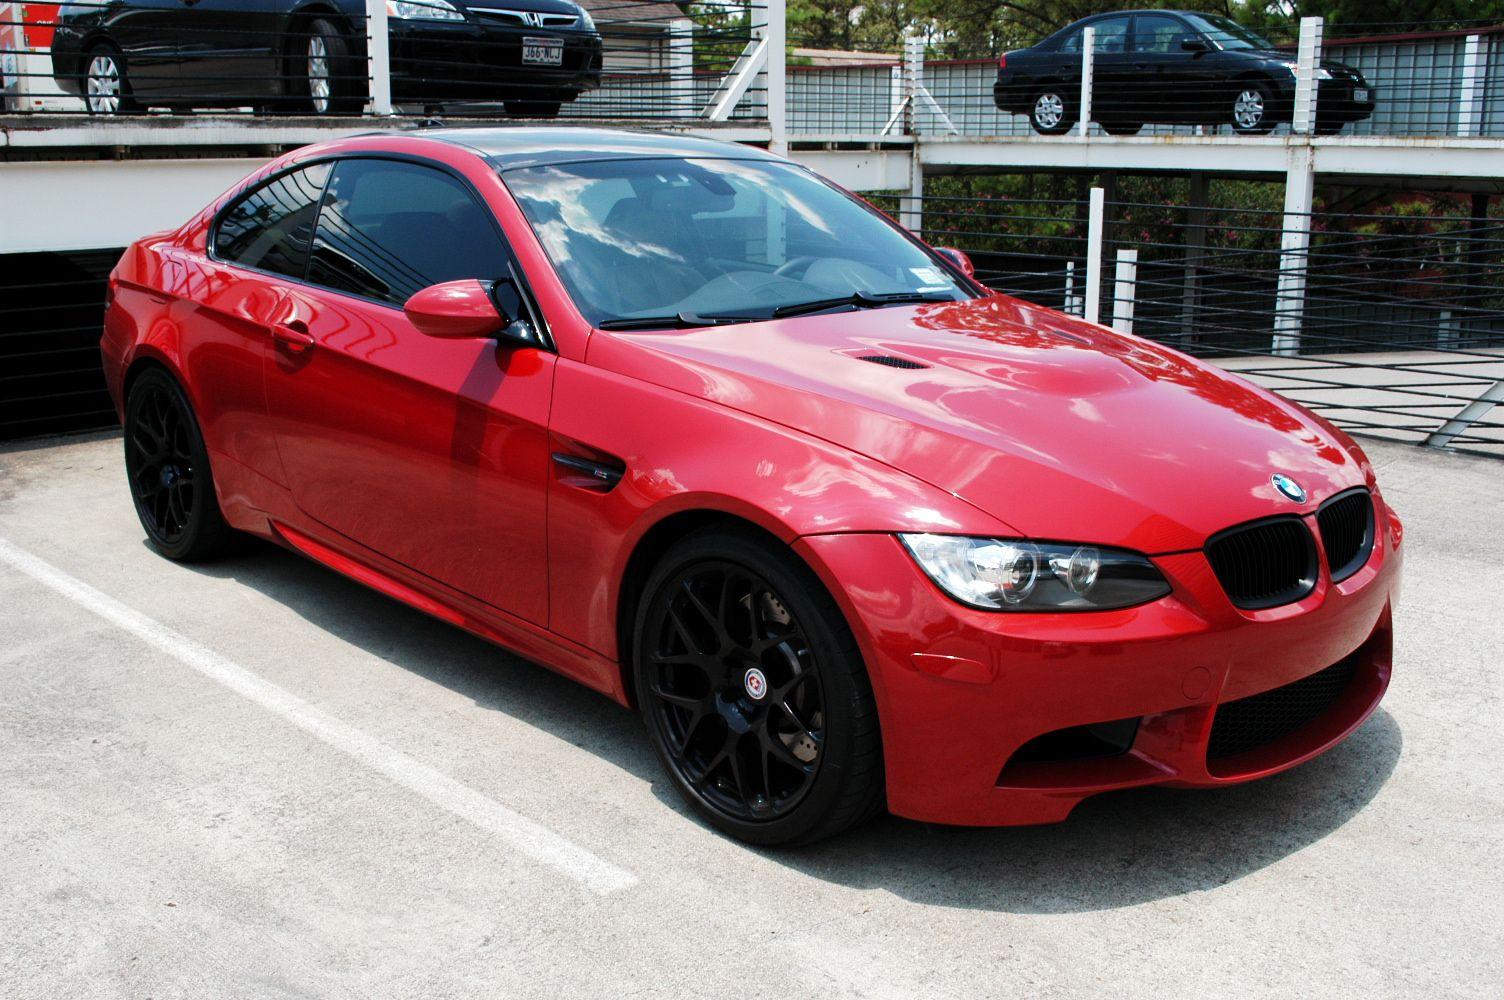 medium resolution of fs 2008 e92 m3 melbourne red bamboo beige cf roof mr interior trim